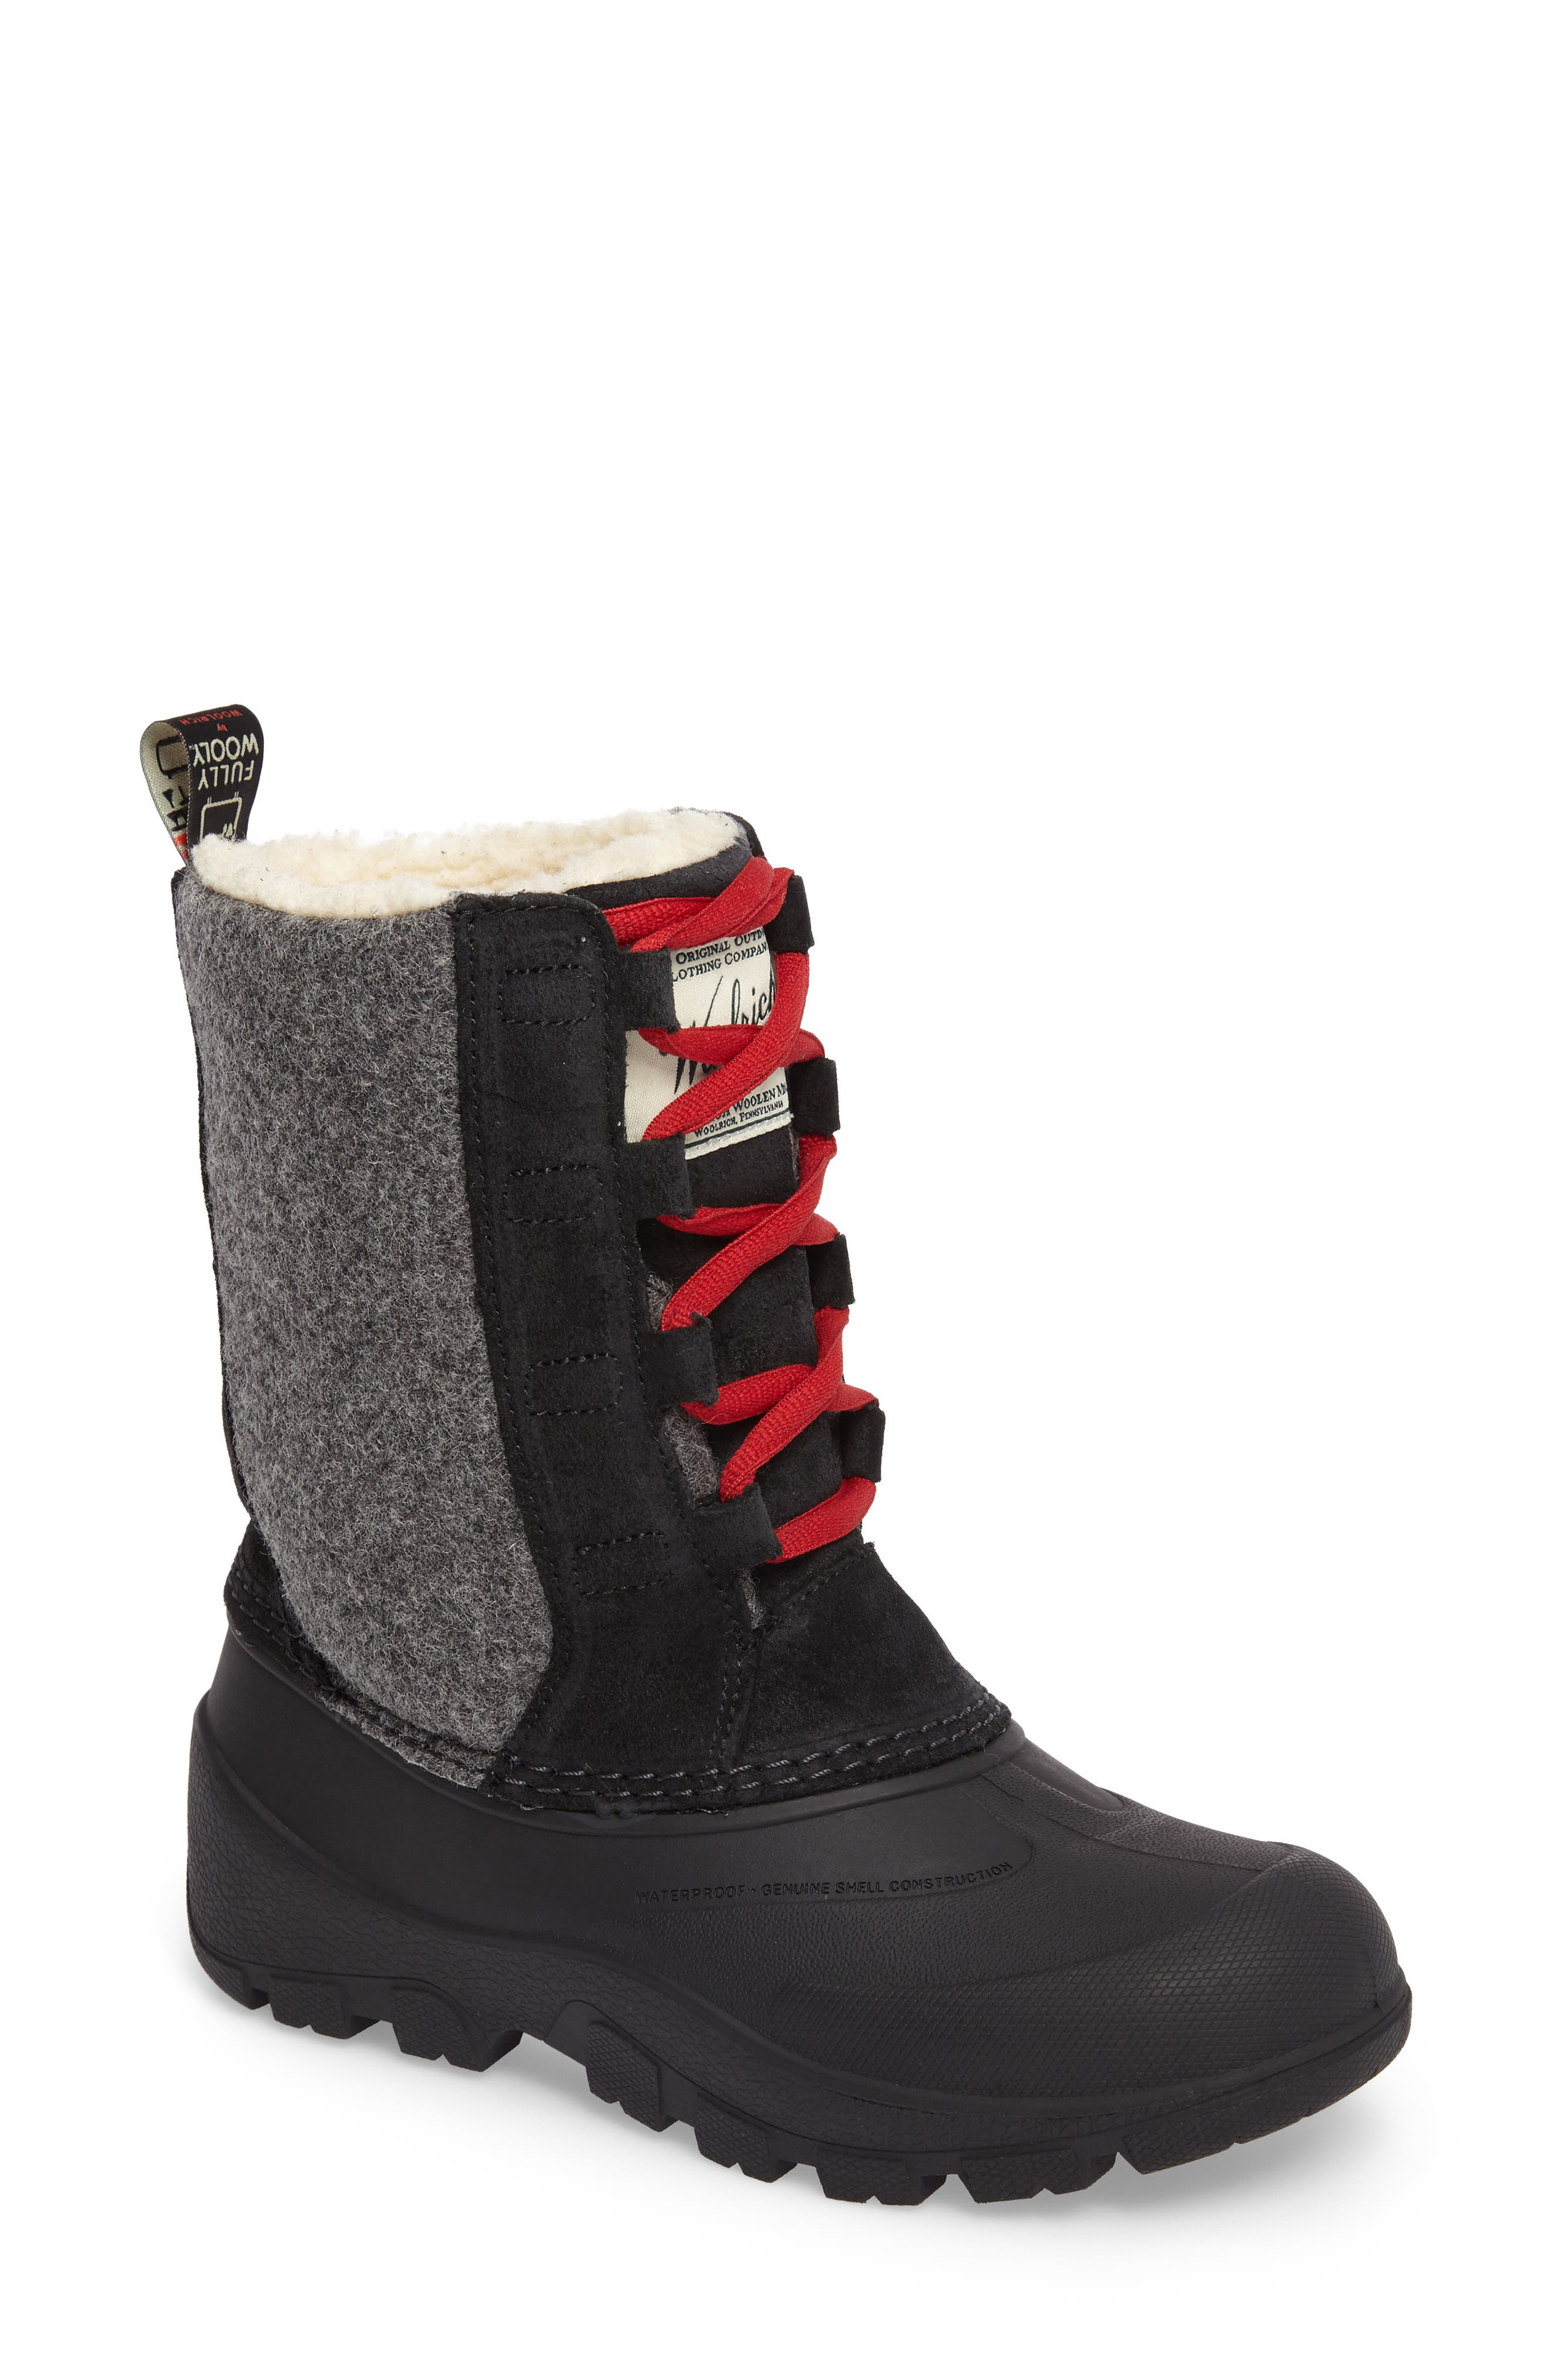 Woolrich Fully Wooly Tundracat Waterproof Insulated Winter Boot (Women)